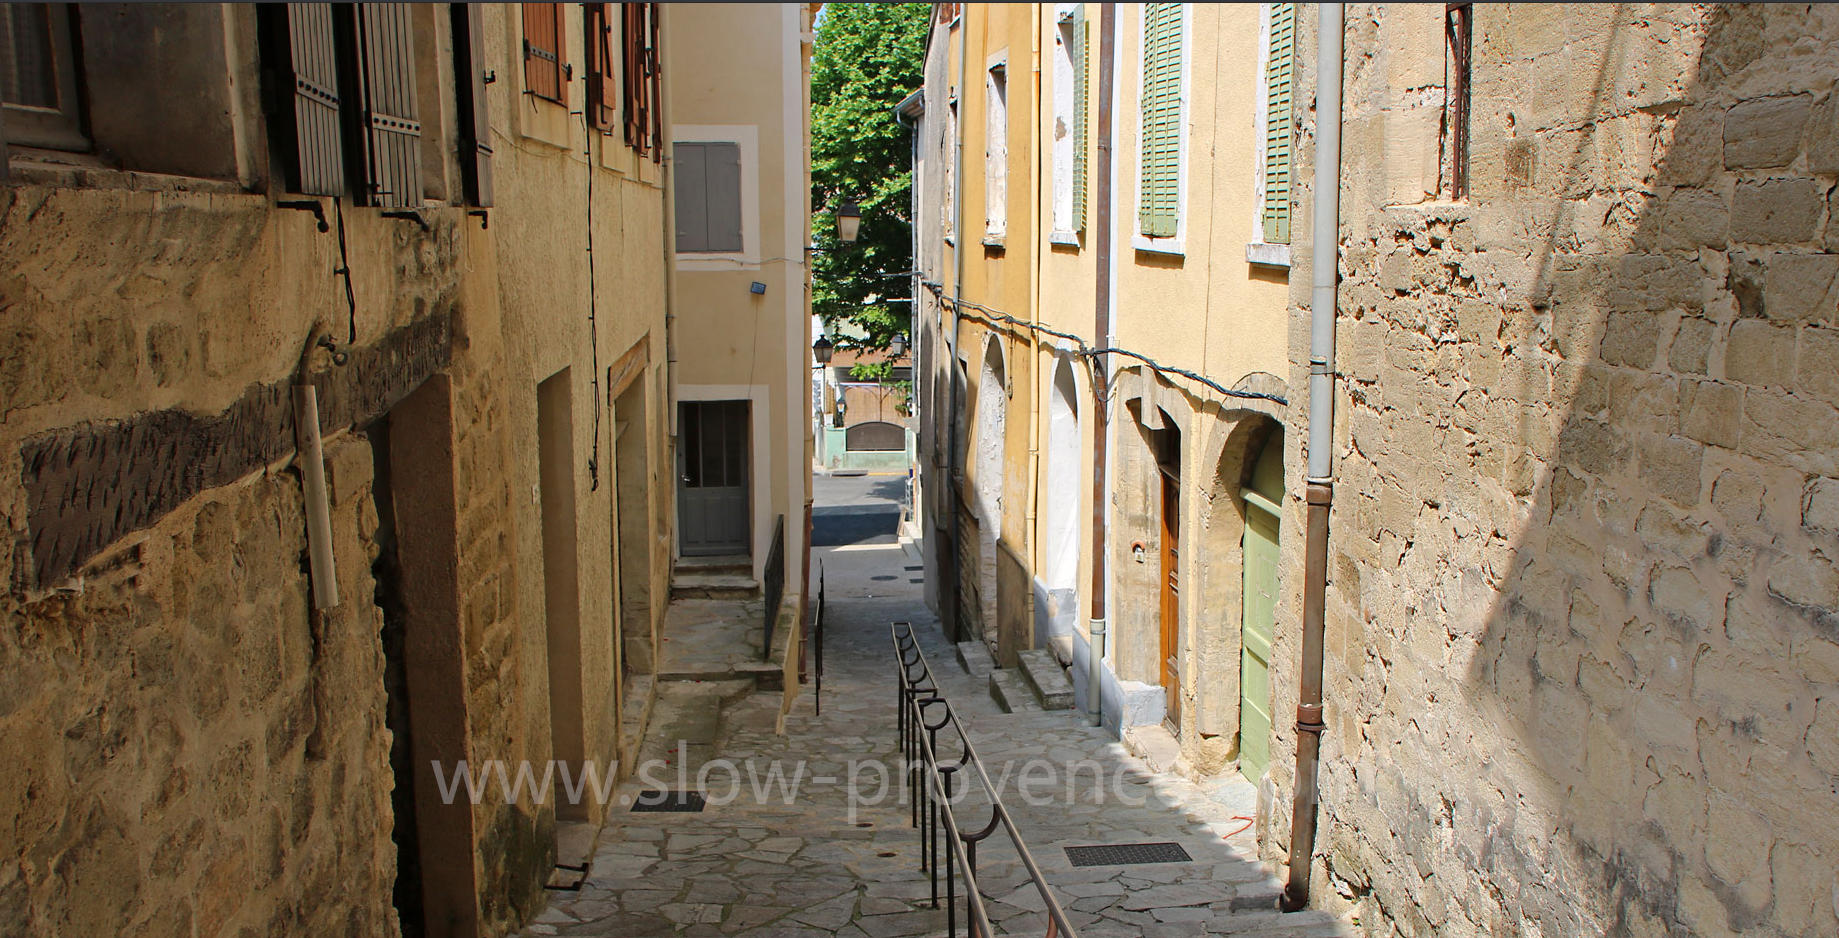 Mormoiron provençal village at the footstep of Mont Ventoux